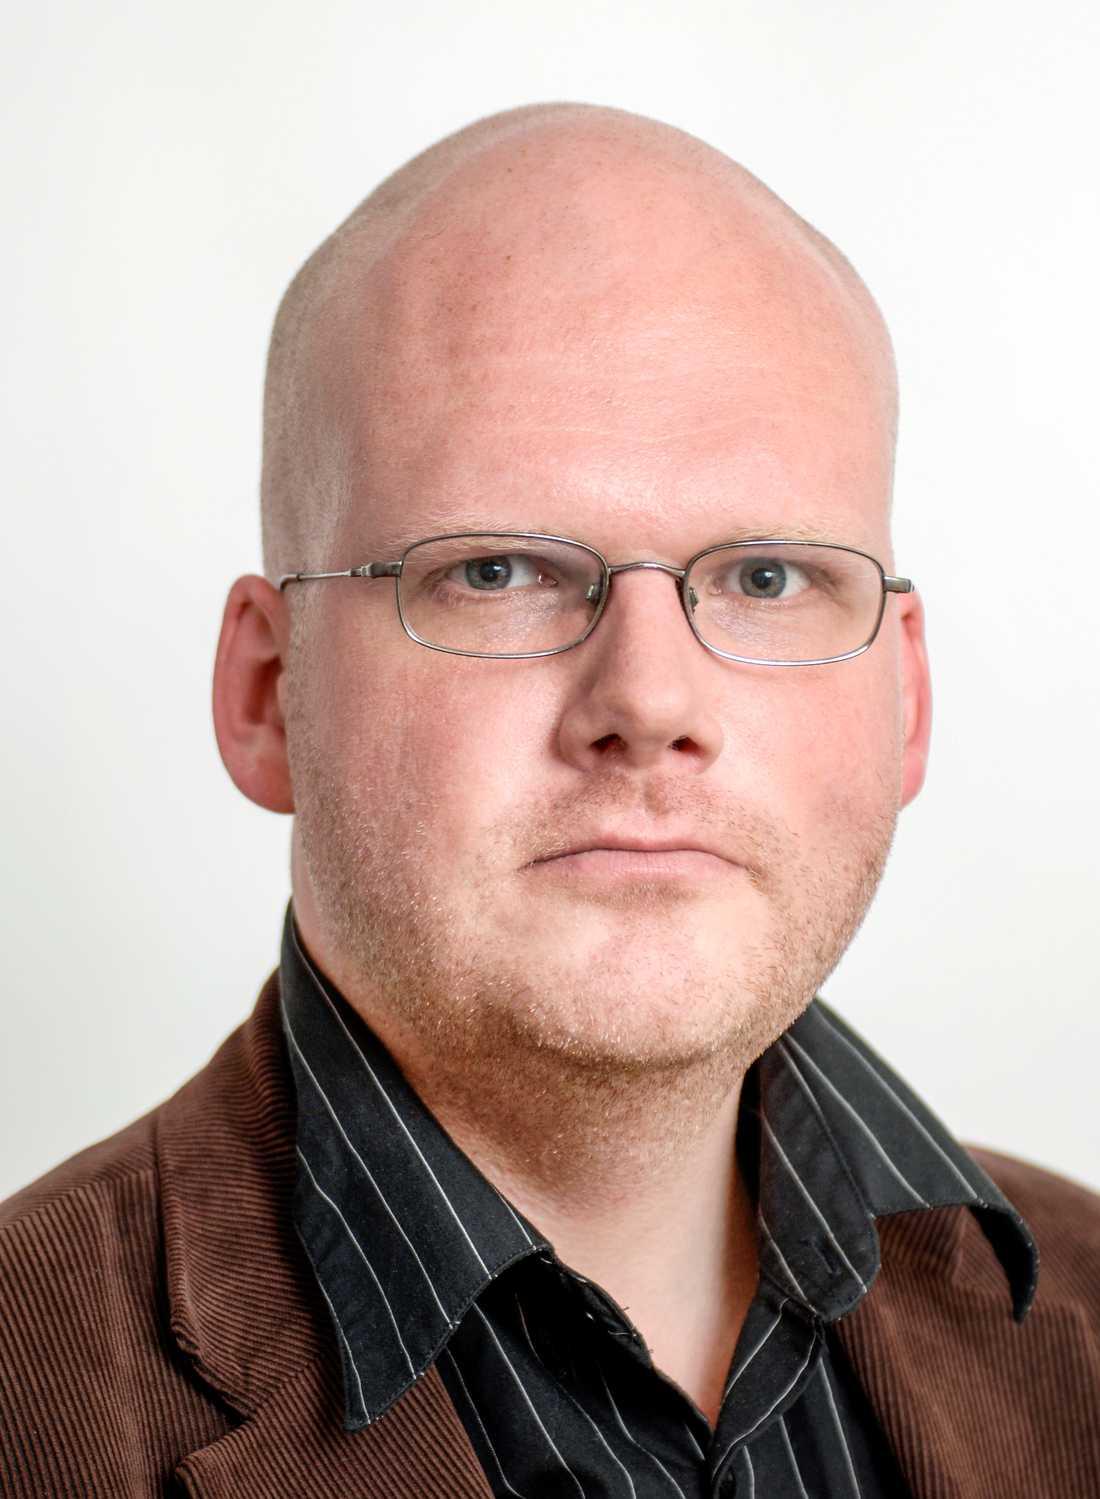 Mikael Grill Pettersson, reporter på SVT.